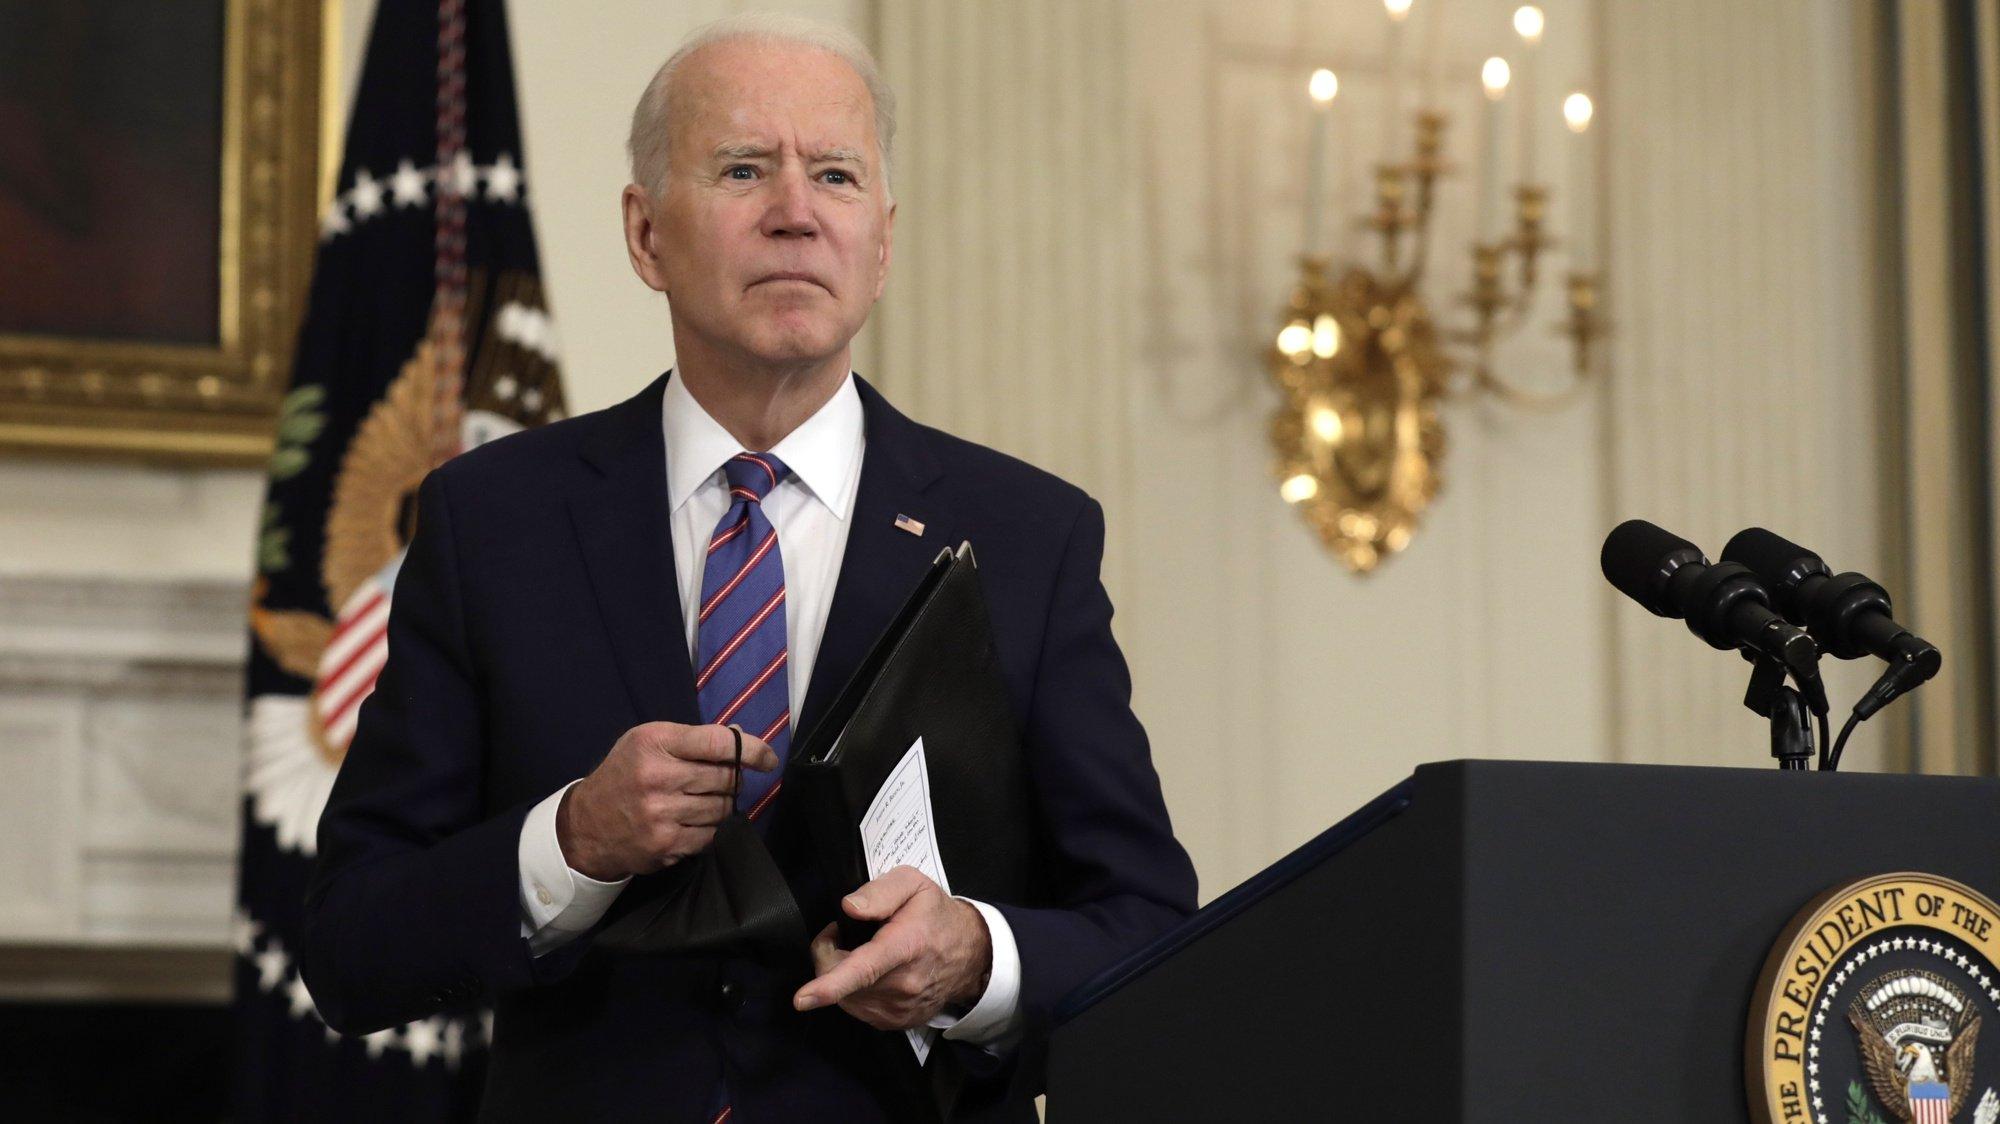 epa09112136 US President Joe Biden delivers remarks on the March jobs report at the White House in Washington, DC, USA, on 02 April 2021.  EPA/Yuri Gripas / POOL